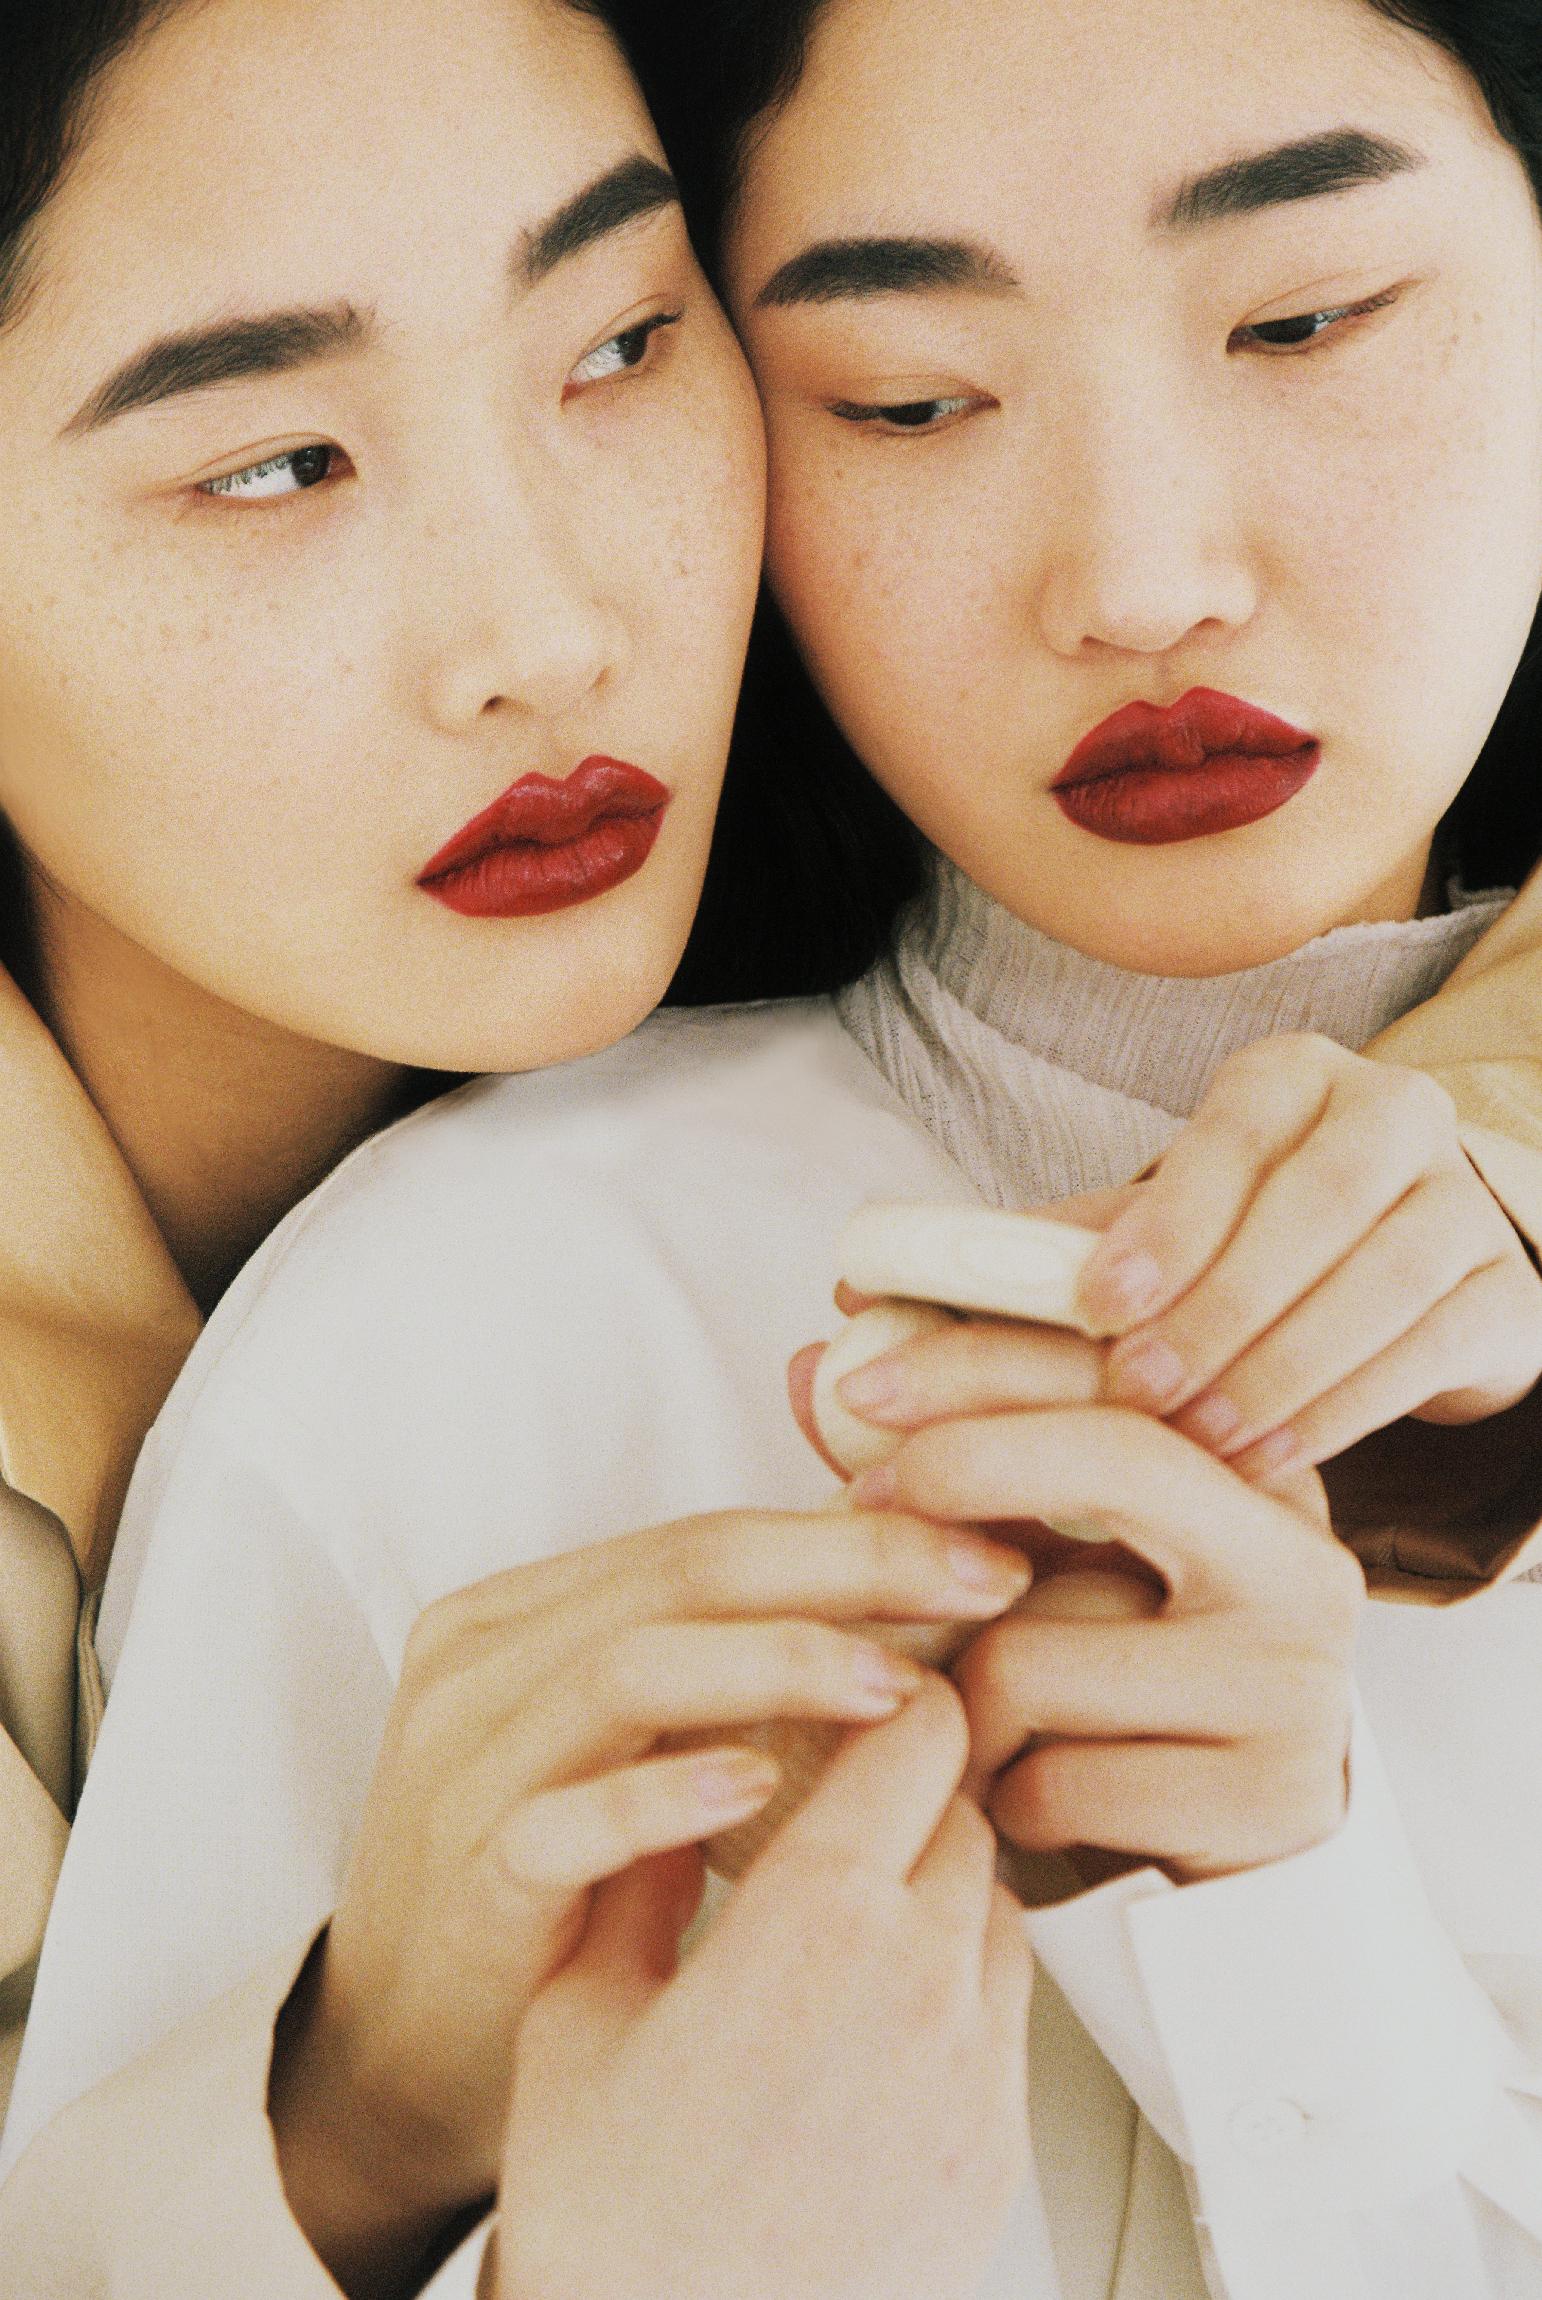 twins_03.jpg